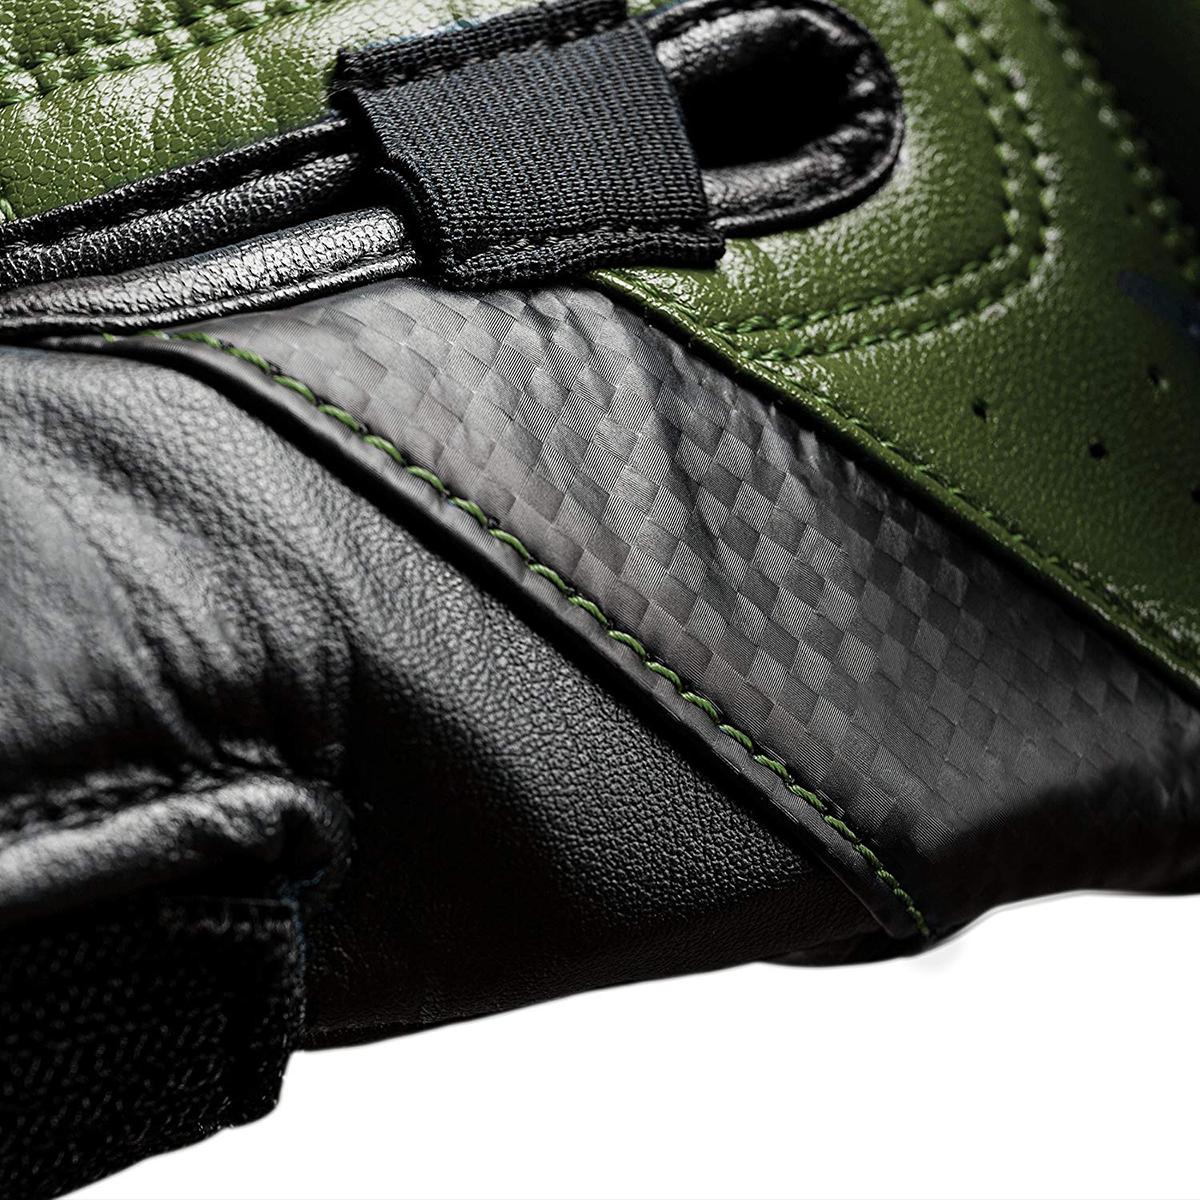 Hayabusa-T3-Dual-X-Hook-and-Loop-Closure-Vylar-Leather-Training-Boxing-Gloves thumbnail 13